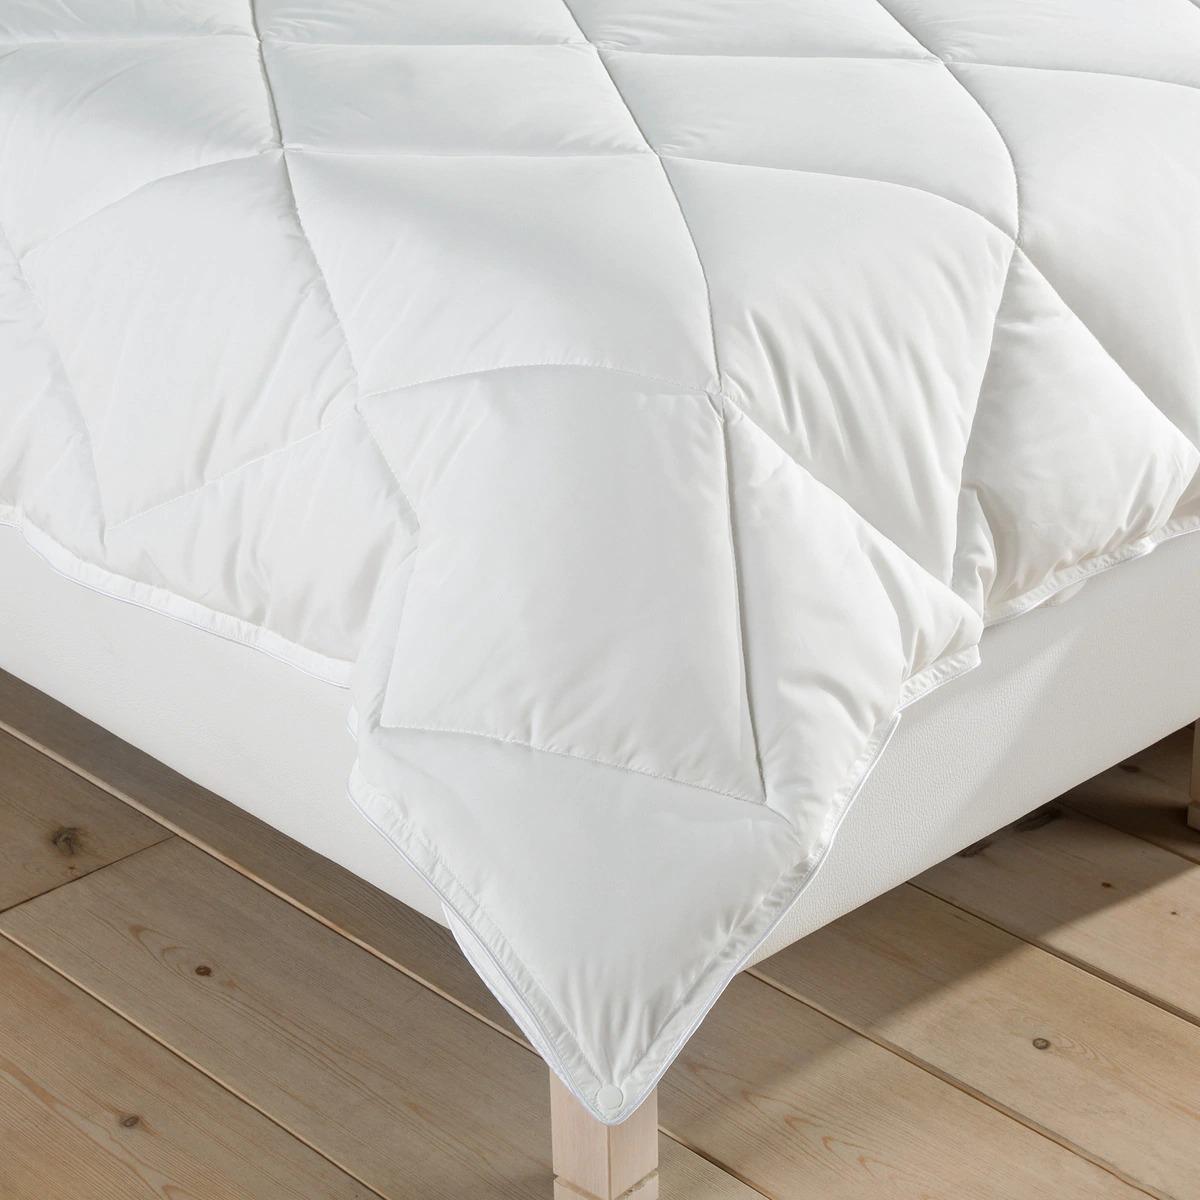 Duo duo 125 + 250 gr / m2 Superior Extra Soft Comfort